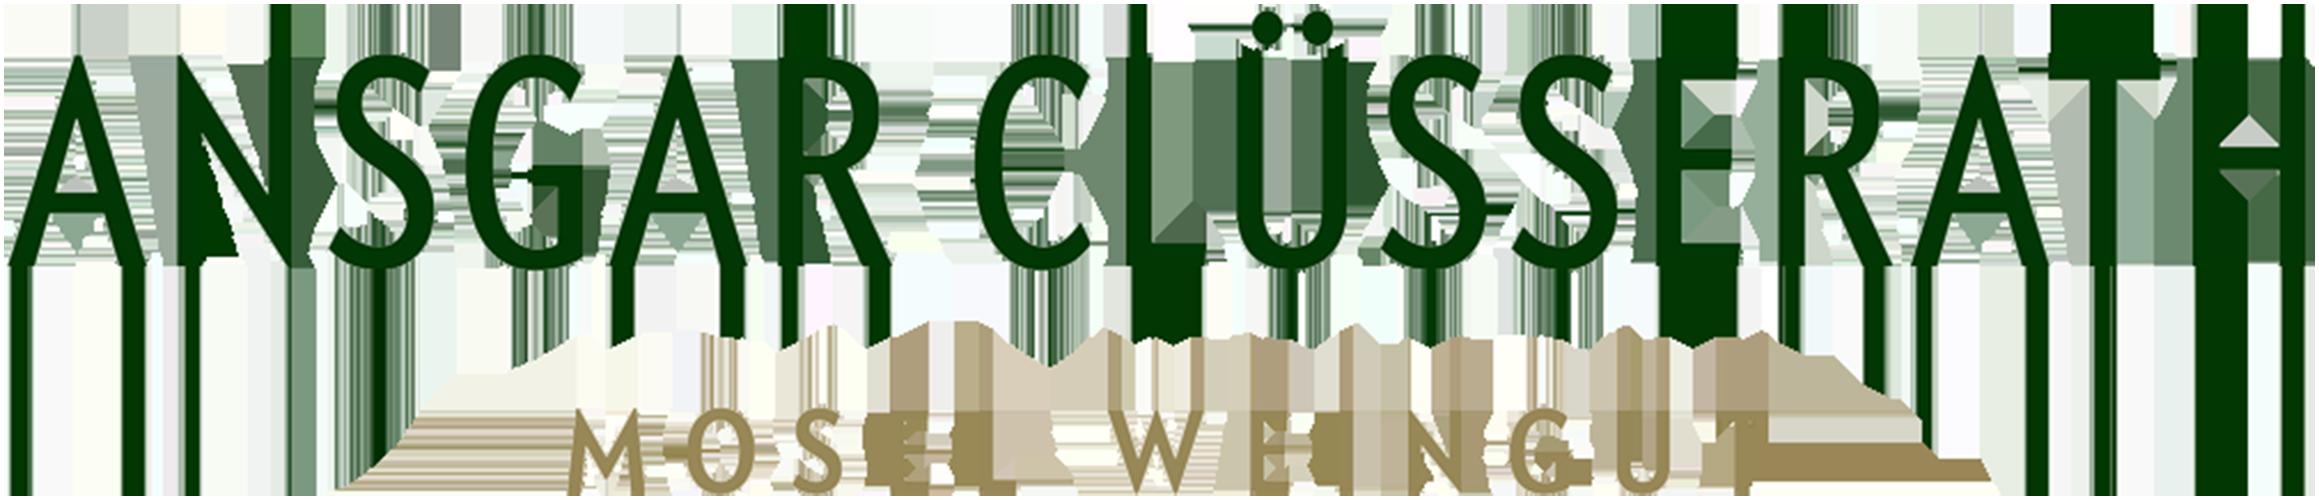 Ansgar Clüsserath